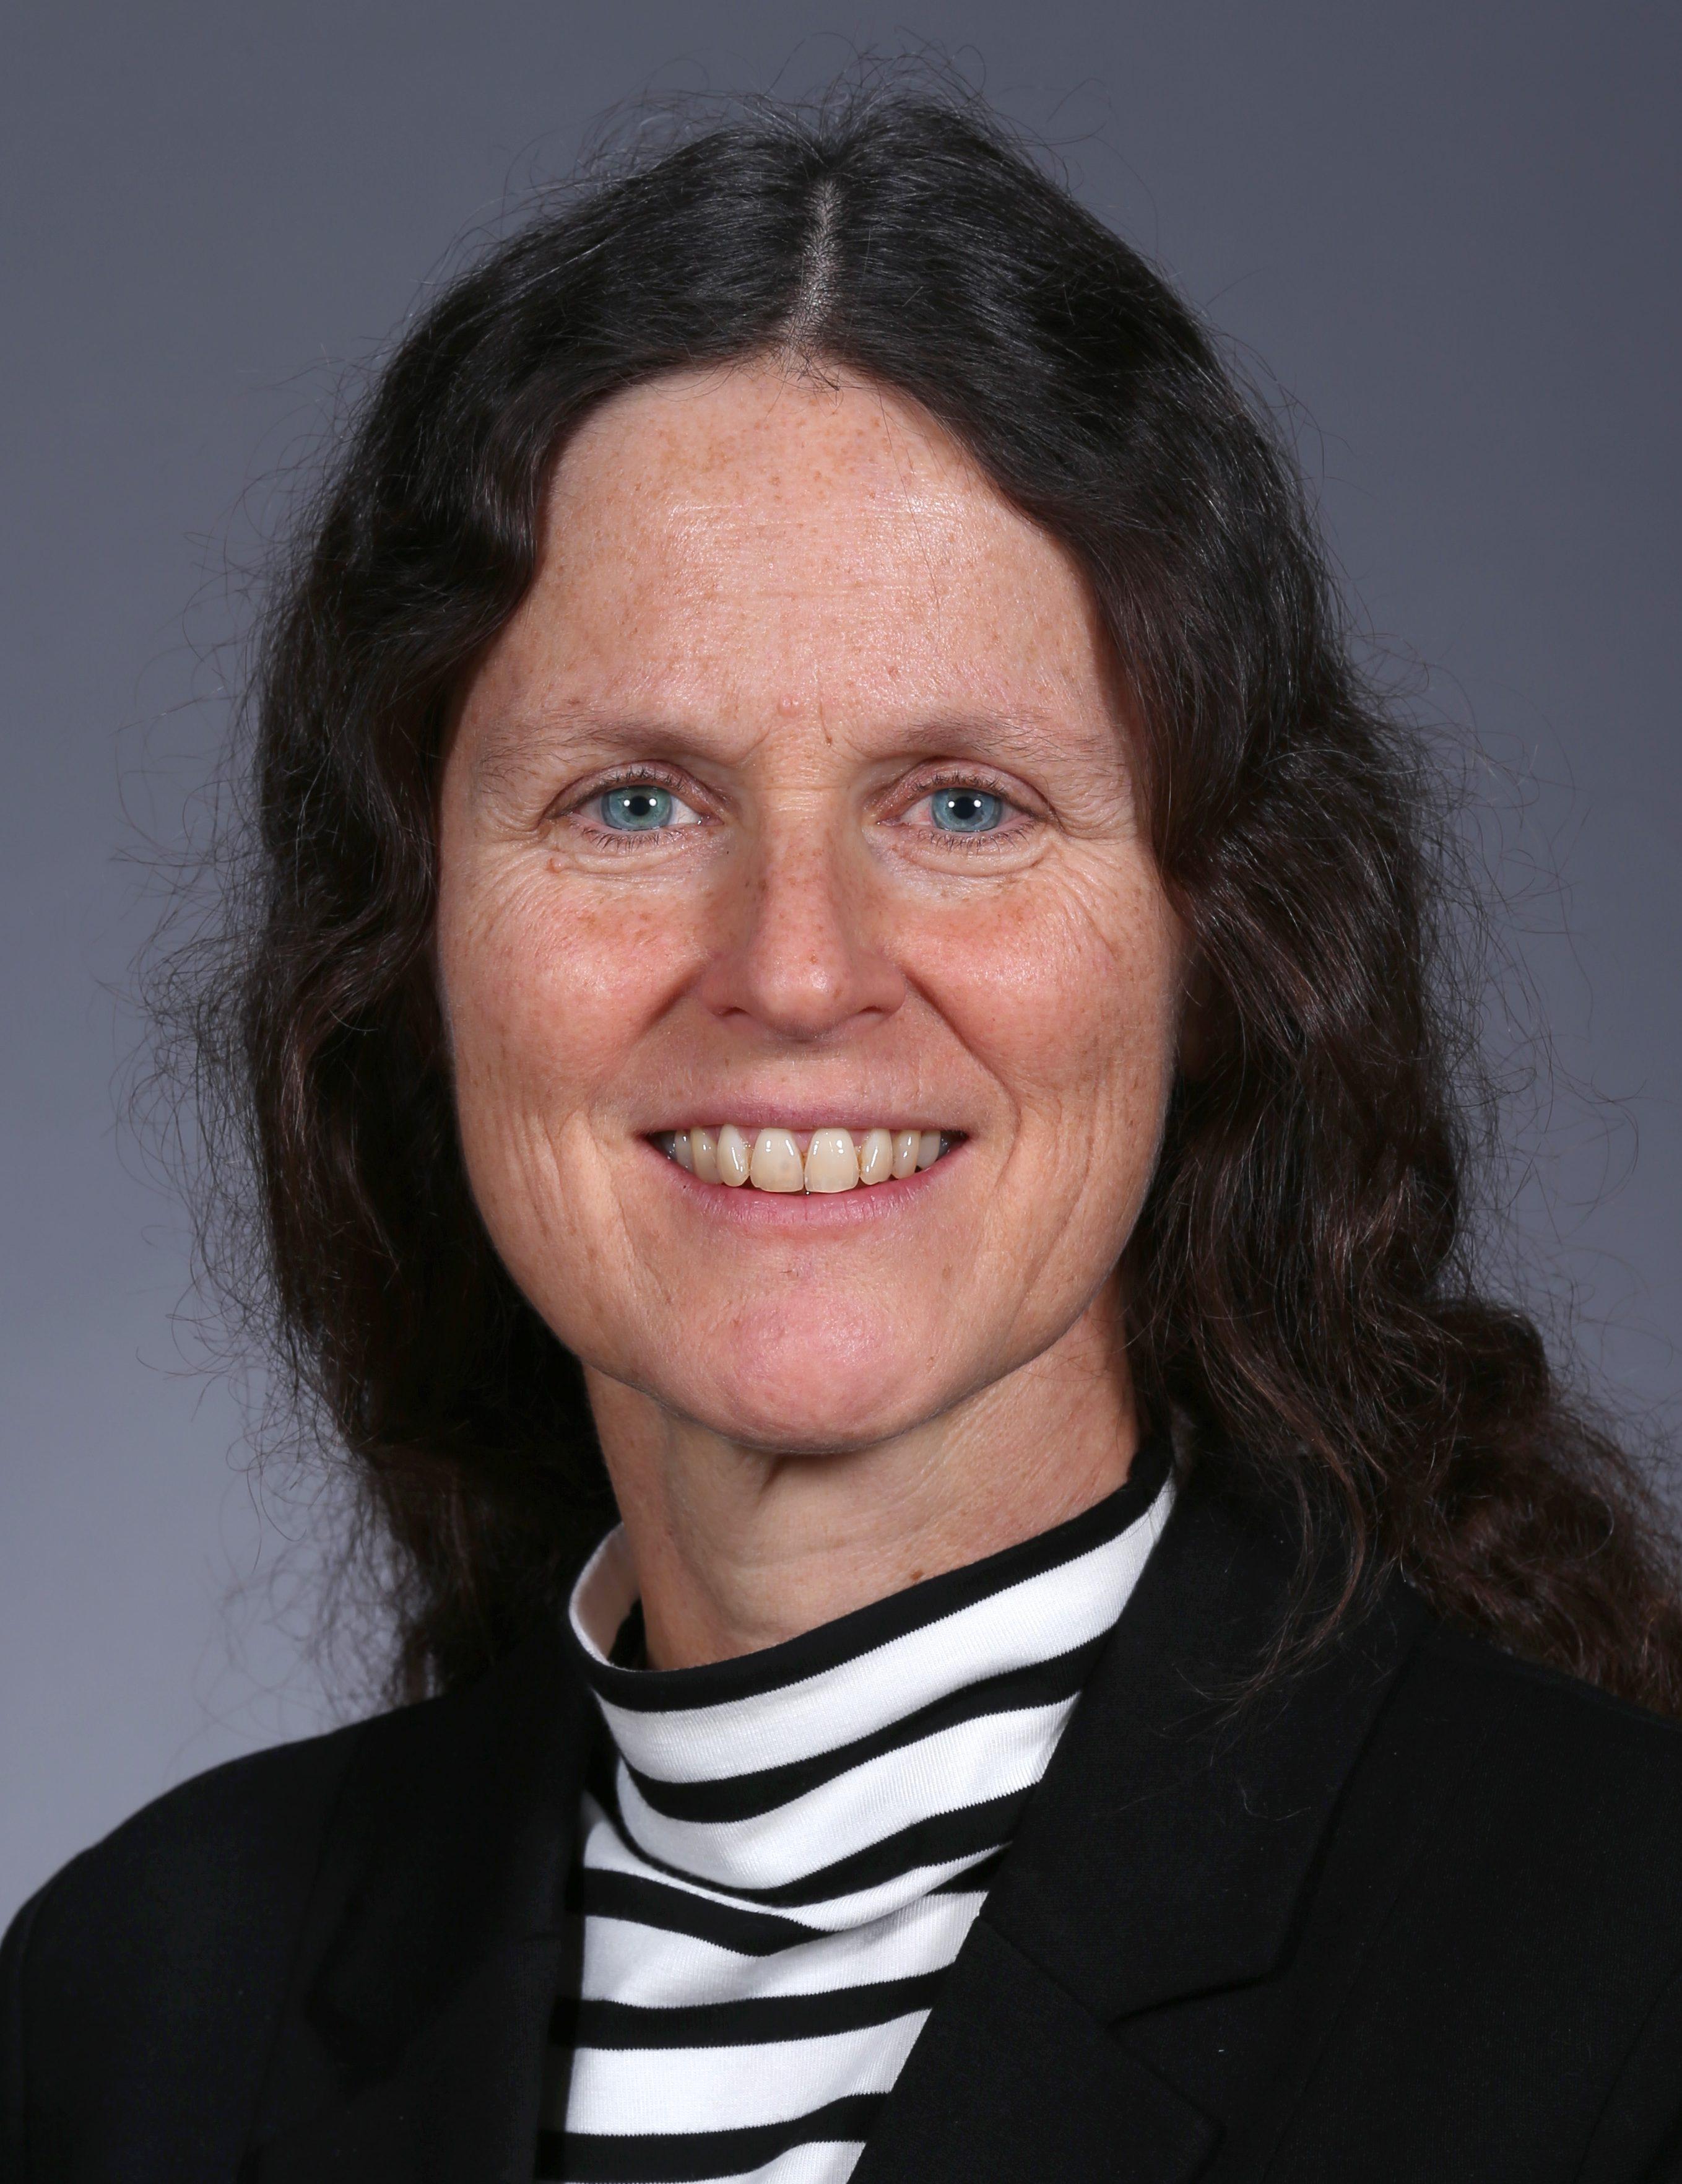 Kristen Johansen, chair of the Roy J. Carver Department of Biochemistry, Biophysics and Molecular Biology.  (Christopher Gannon/Iowa State University)